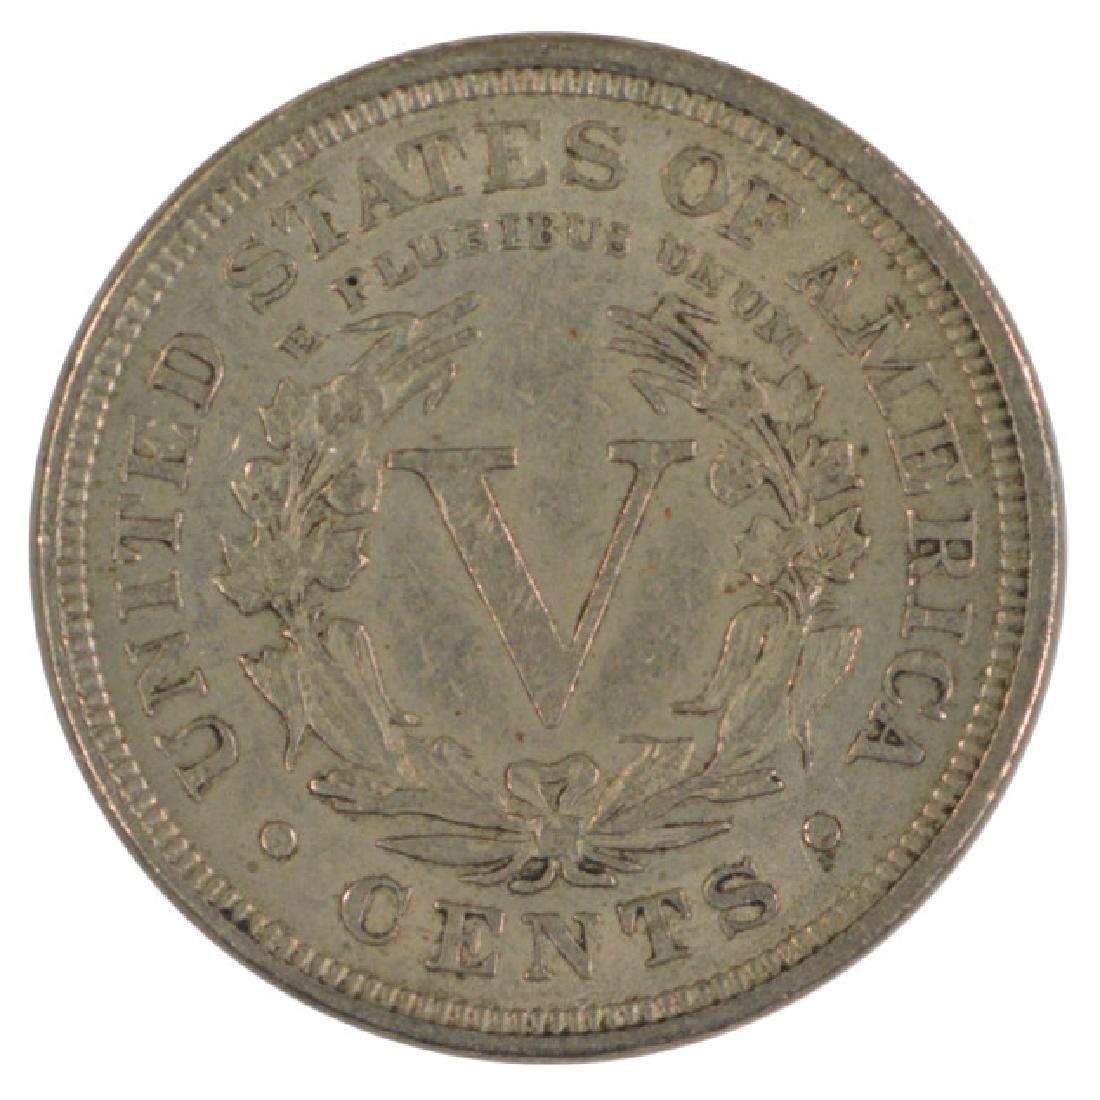 1898 Liberty Nickel Coin - 2